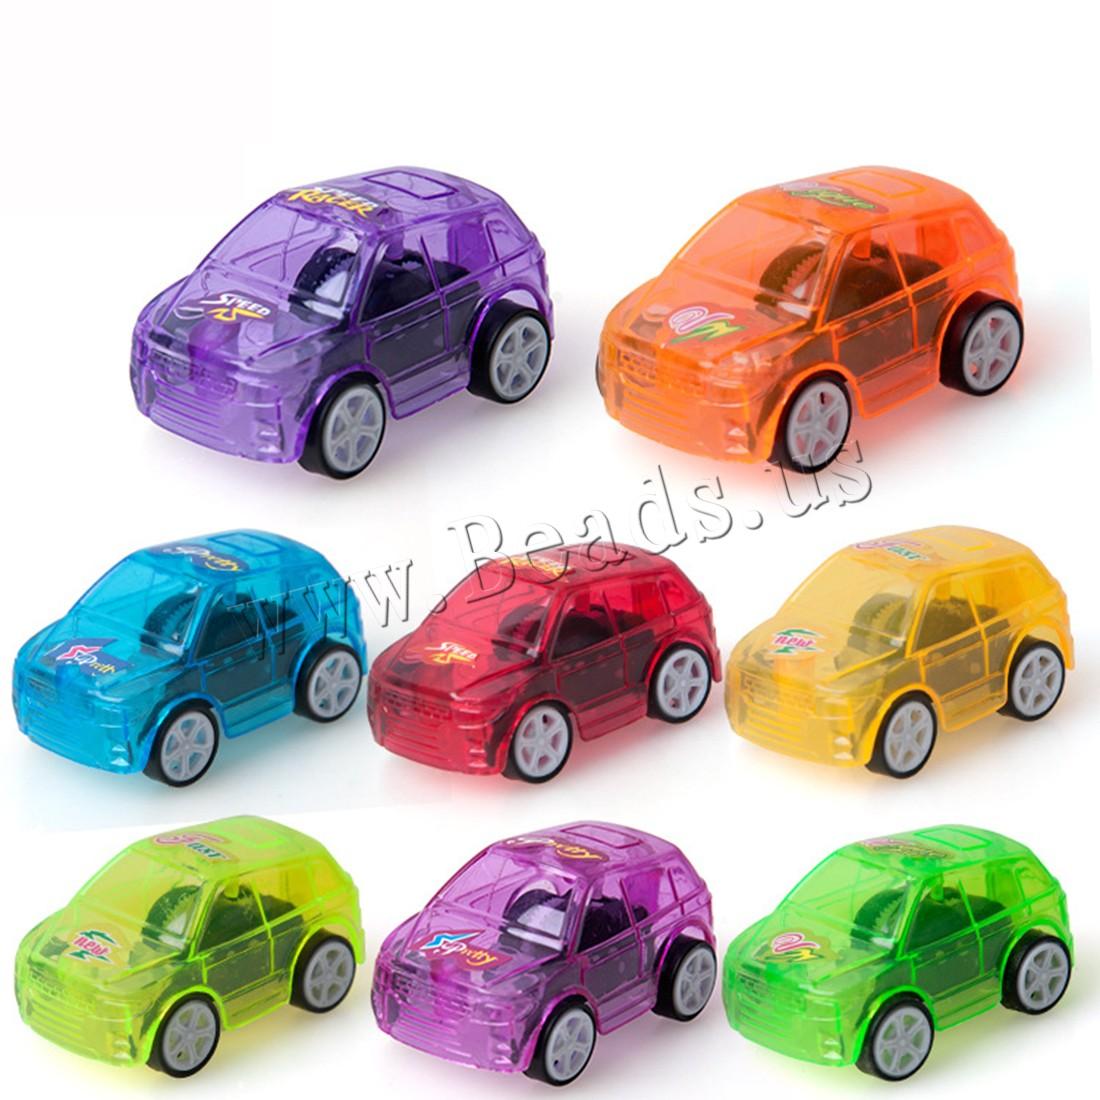 Buy ABS Plastic Car Toy children & transparent mixed colors 50x30x25mm 8PCs/Bag Sold Bag